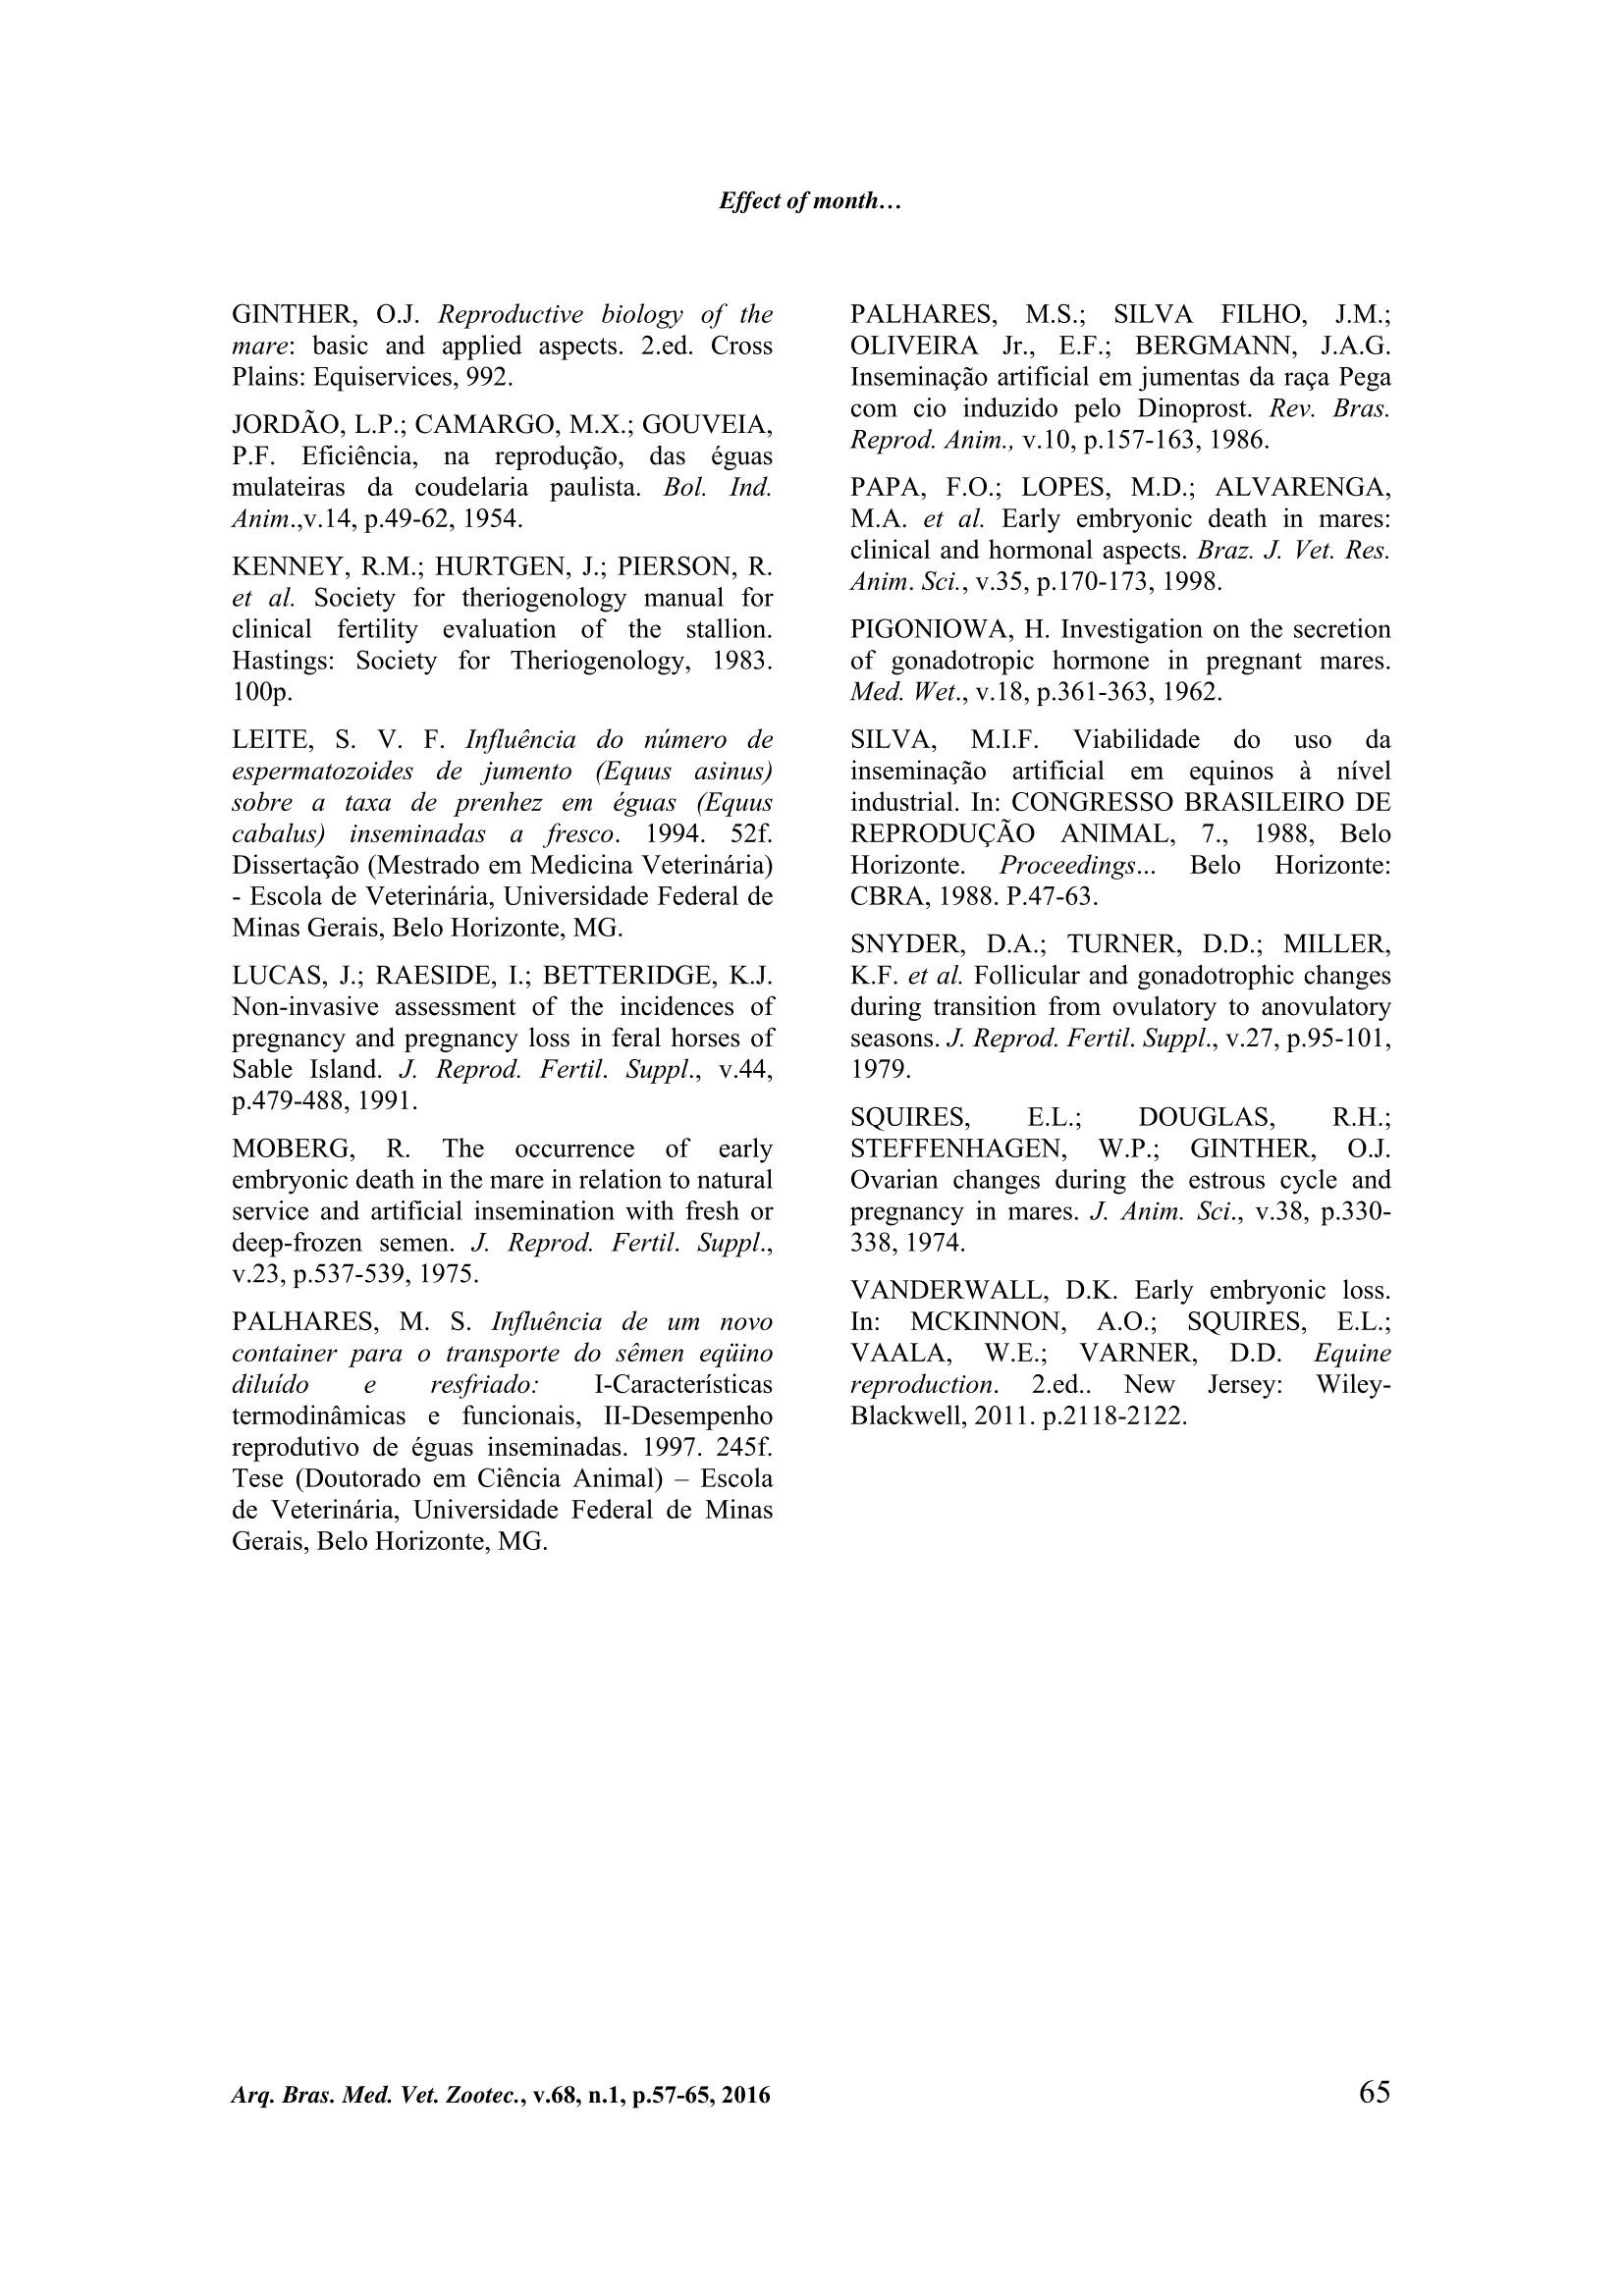 AMA 3-9 (1).png